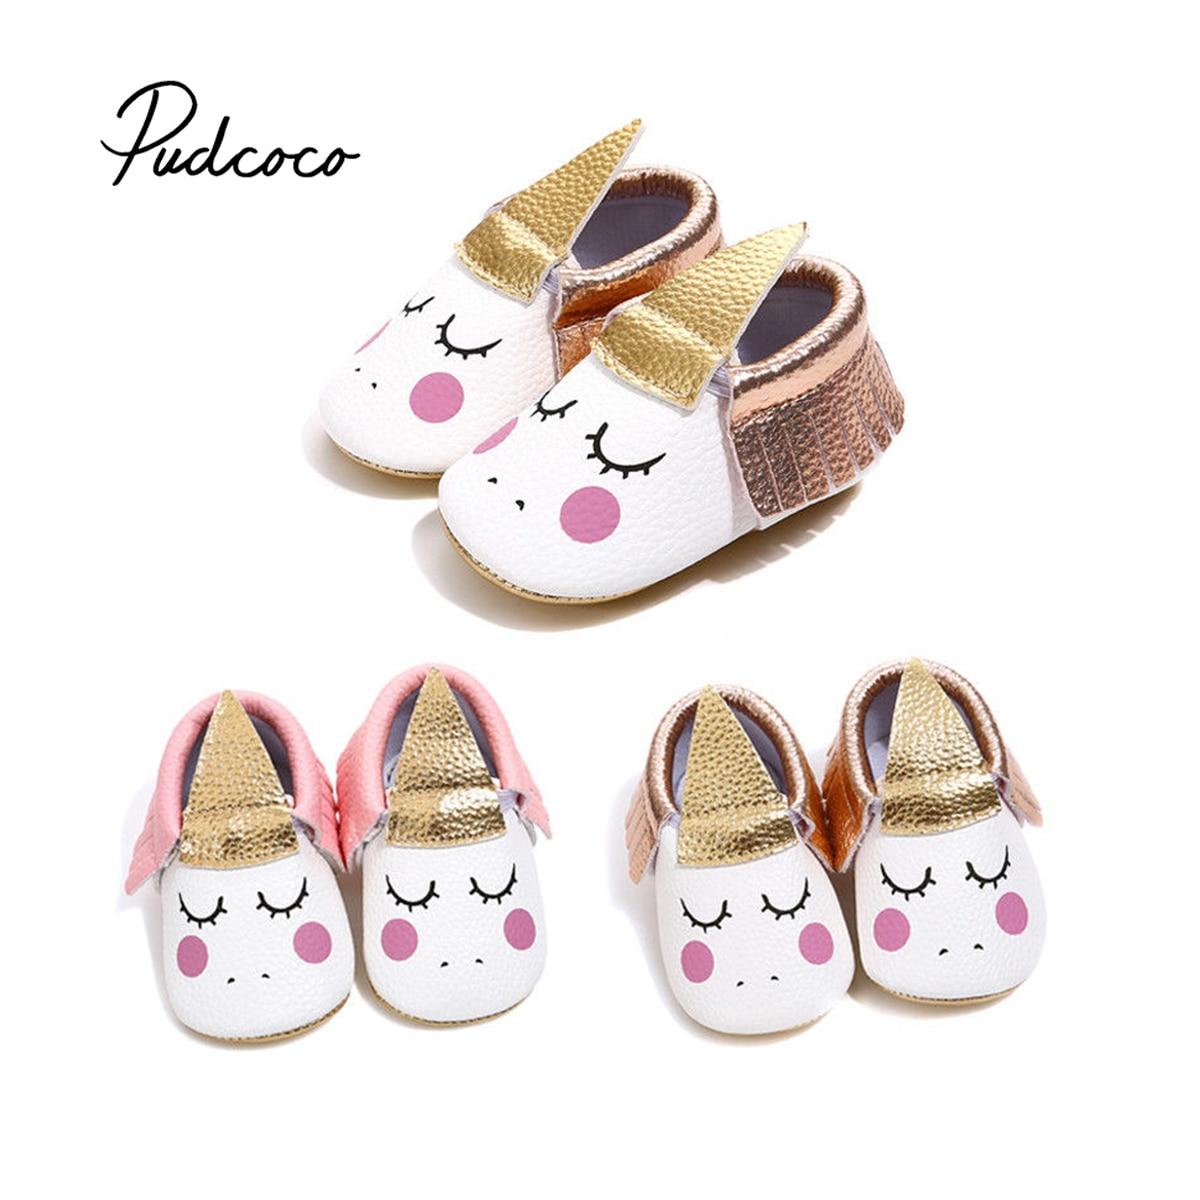 Pudcoco Cute Baby Boy Girl Sandals Infant Newborn Tassel ...